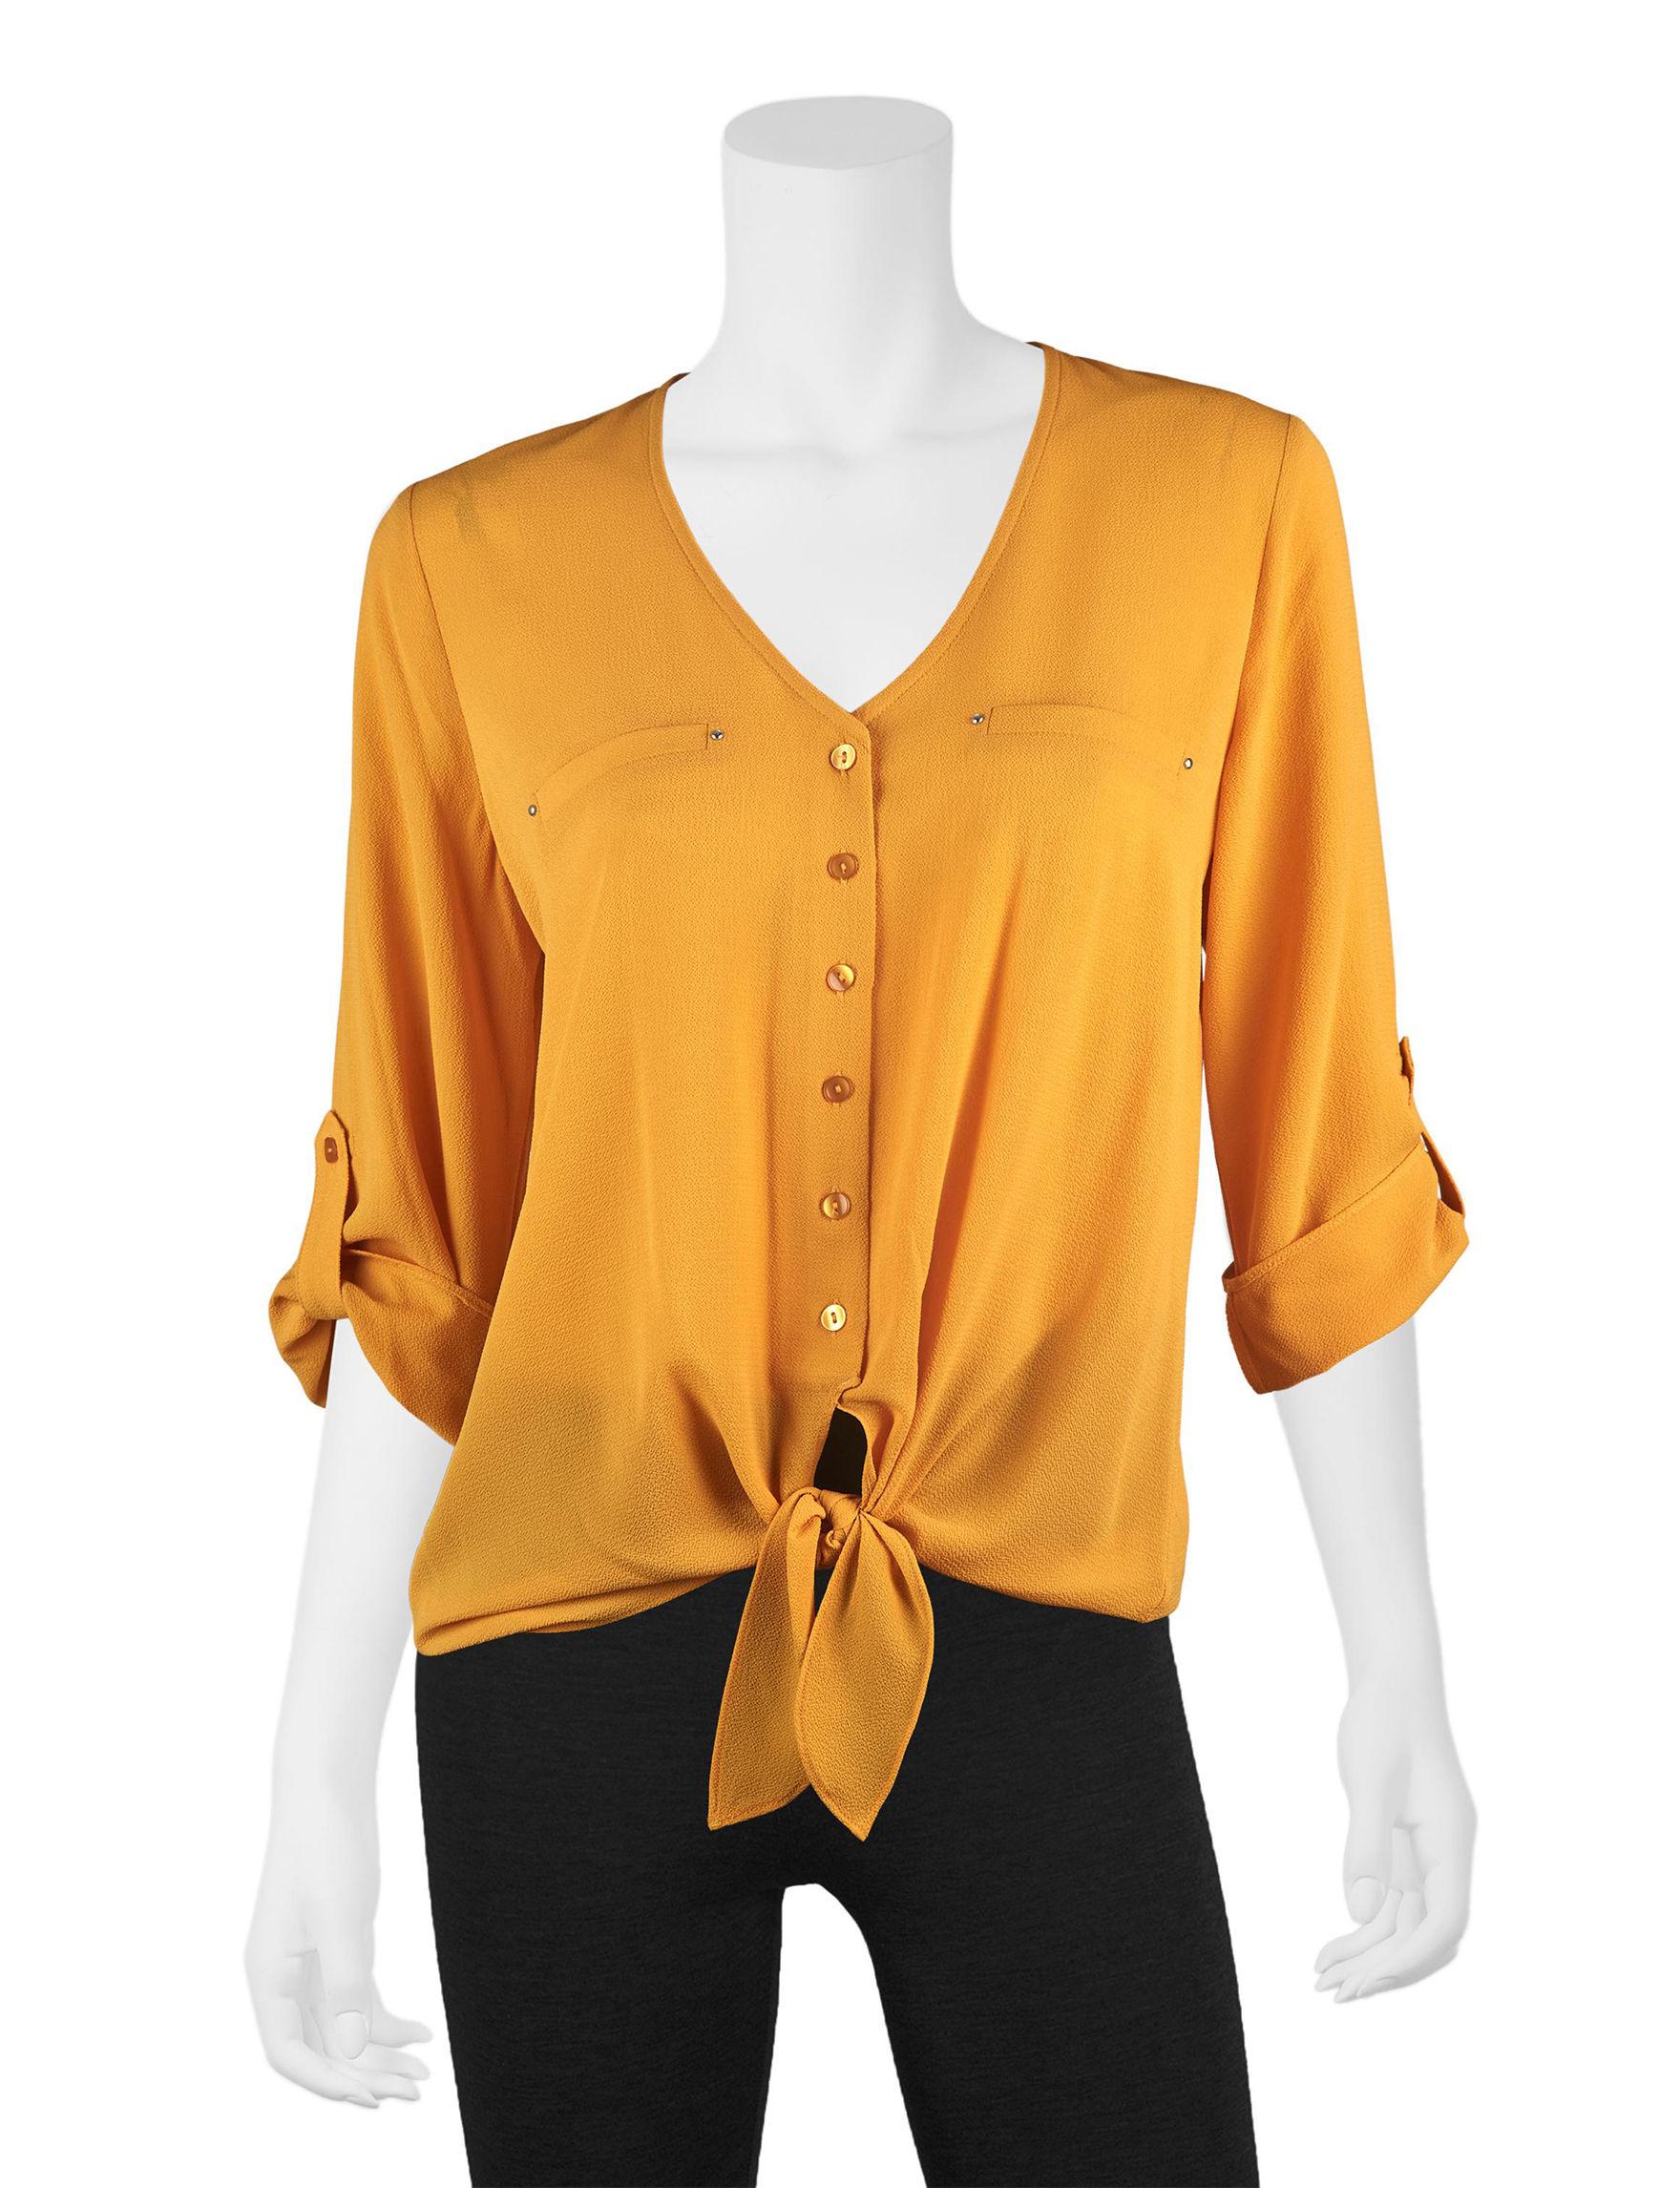 A. Byer Honey Beige Shirts & Blouses